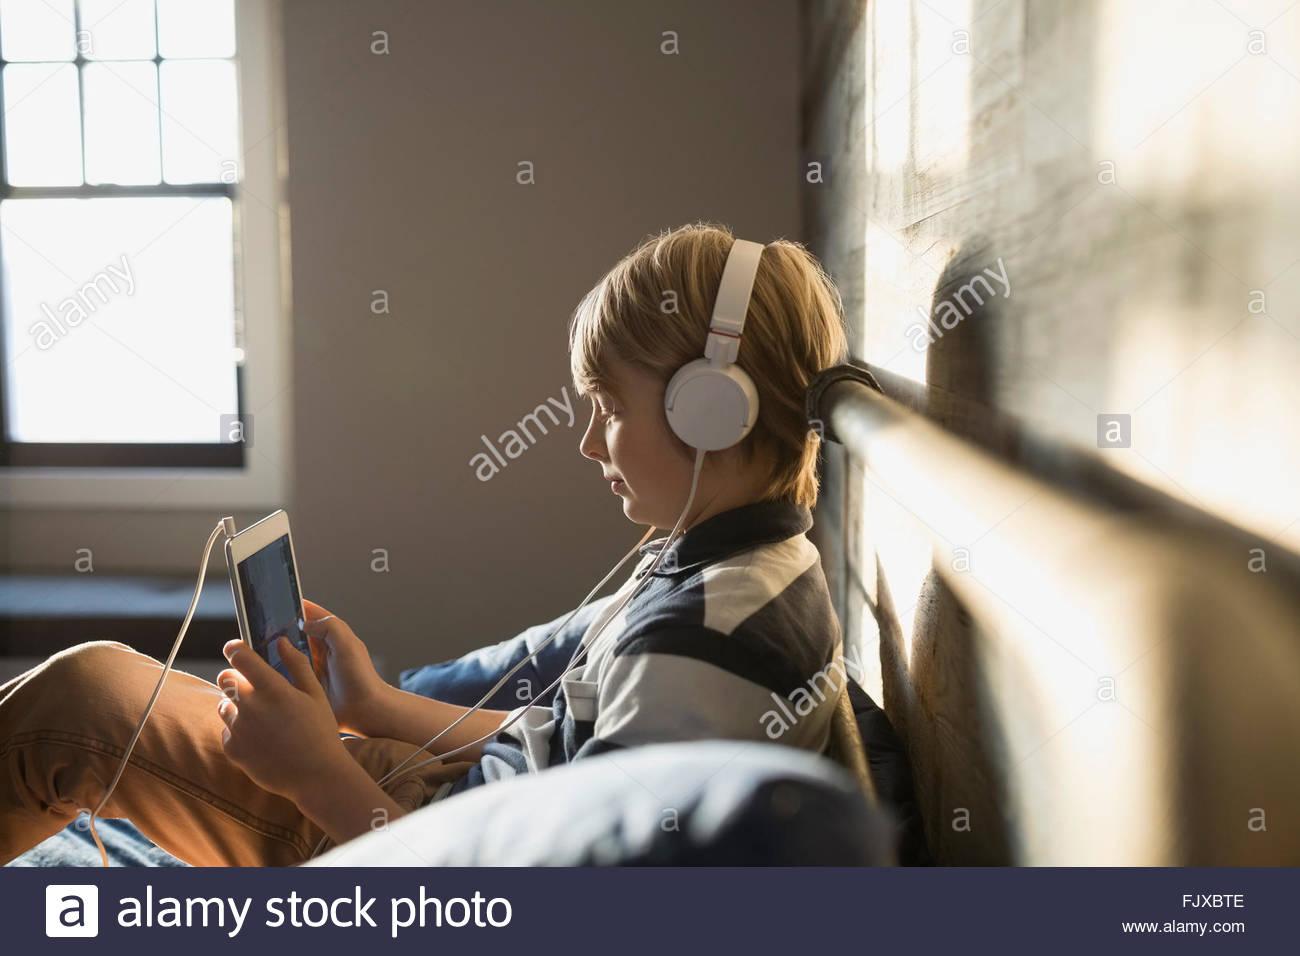 Junge mit Kopfhörer mit digital-Tablette Stockfoto